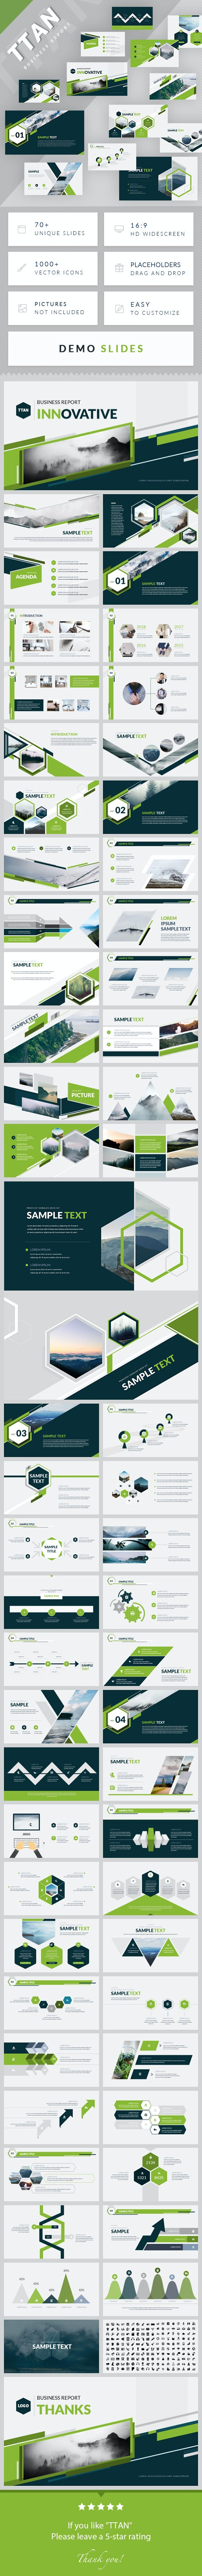 TTAN - Minimal Simple Google Slides Template - Google Slides Presentation Templates